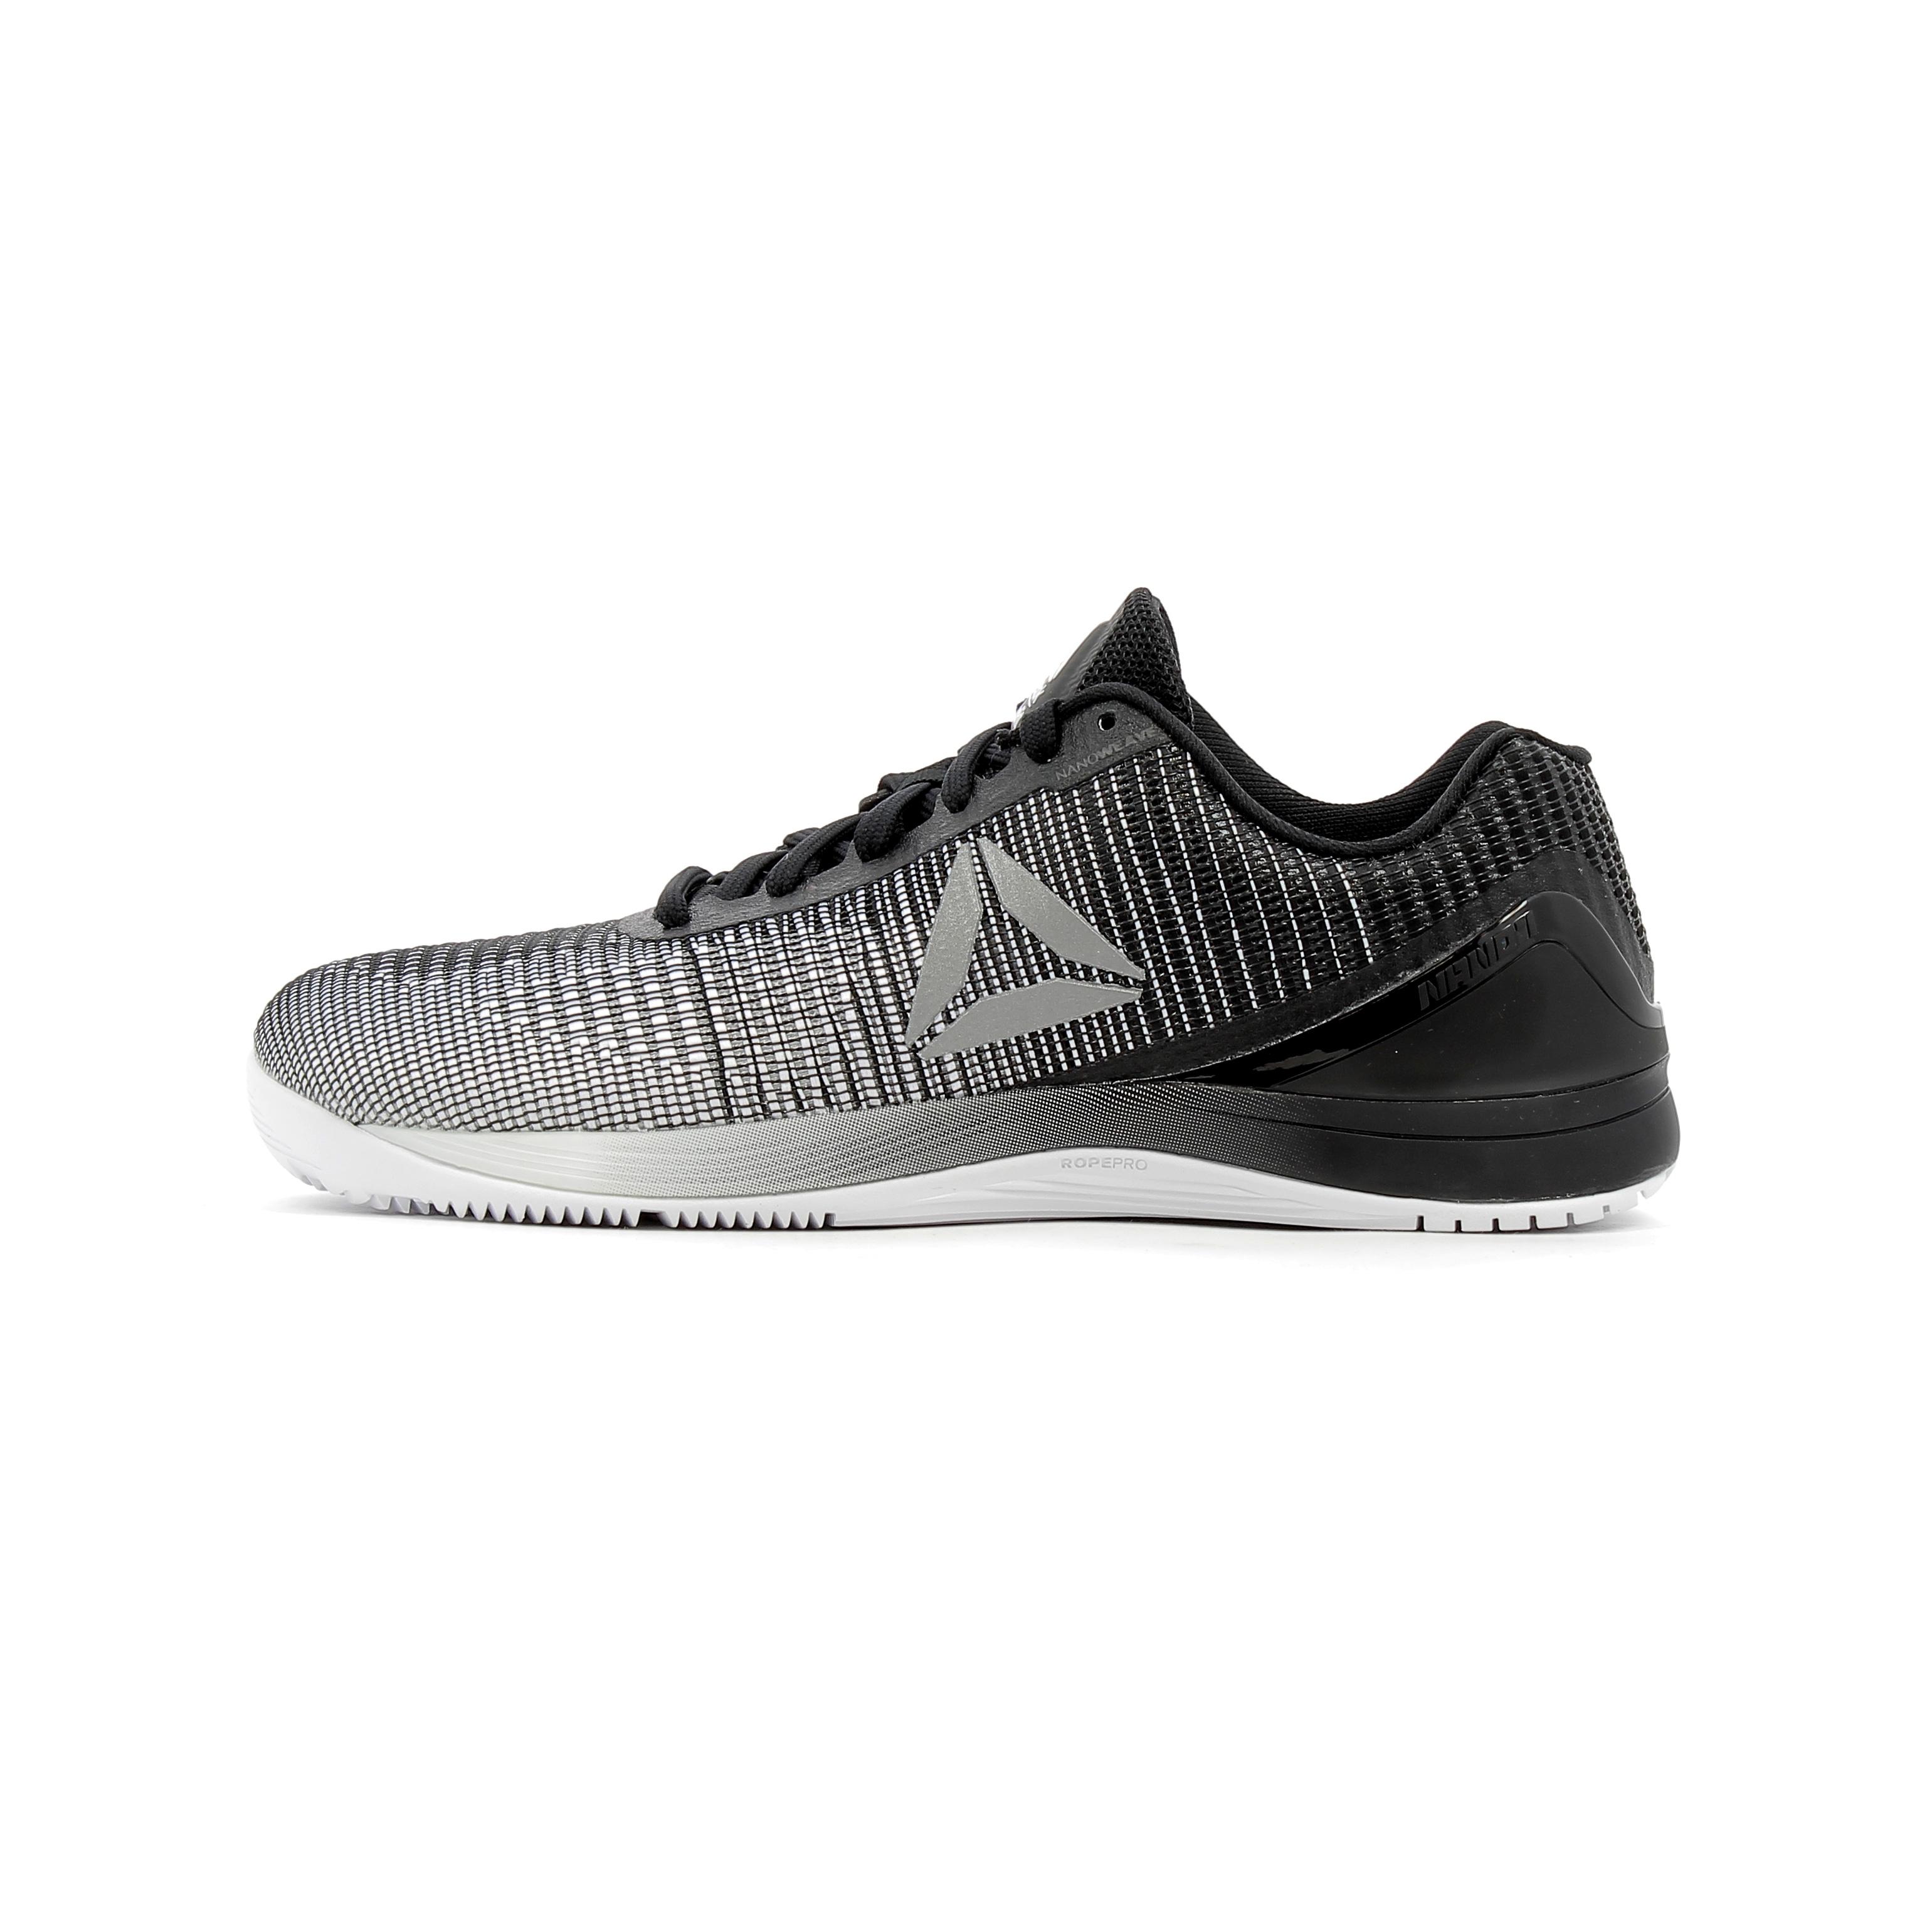 a33b0d078d4f Chaussures de Cross Training Reebok CrossFit Nano 7 Weave Noir ...